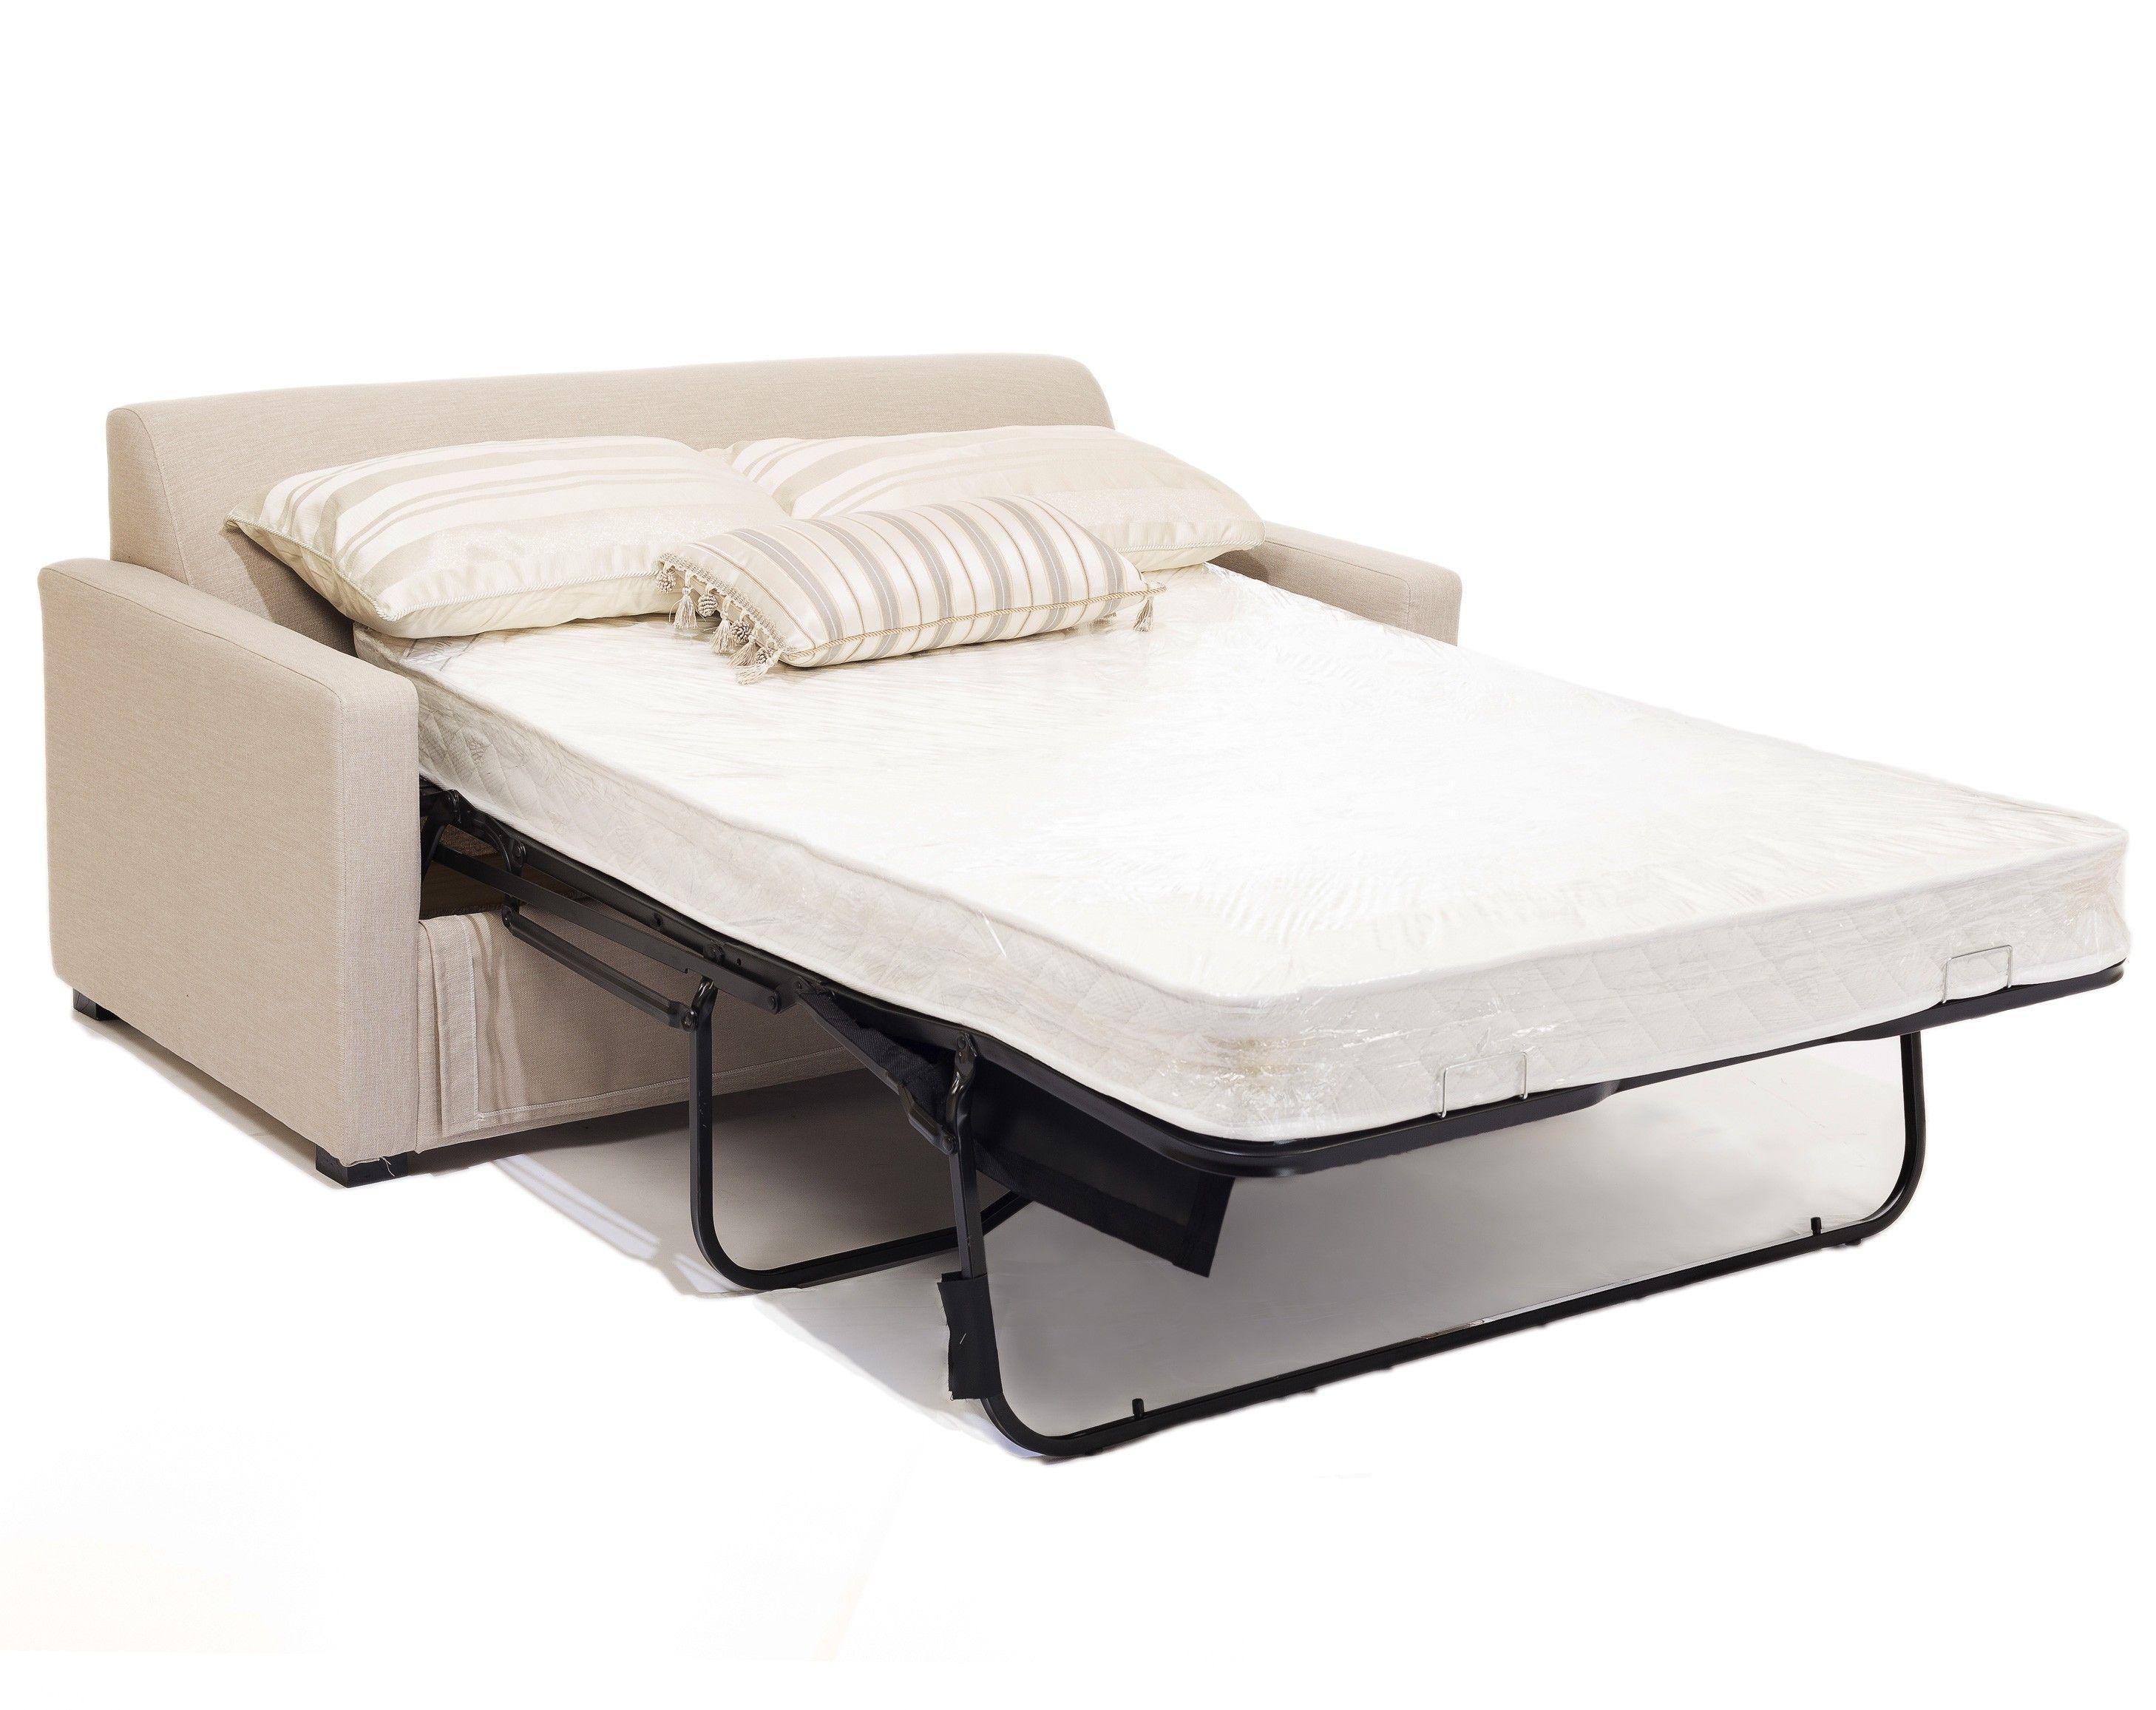 Mattress Sofa Sofa Bed Mattress Loveseat Sleeper Sofa Mattress